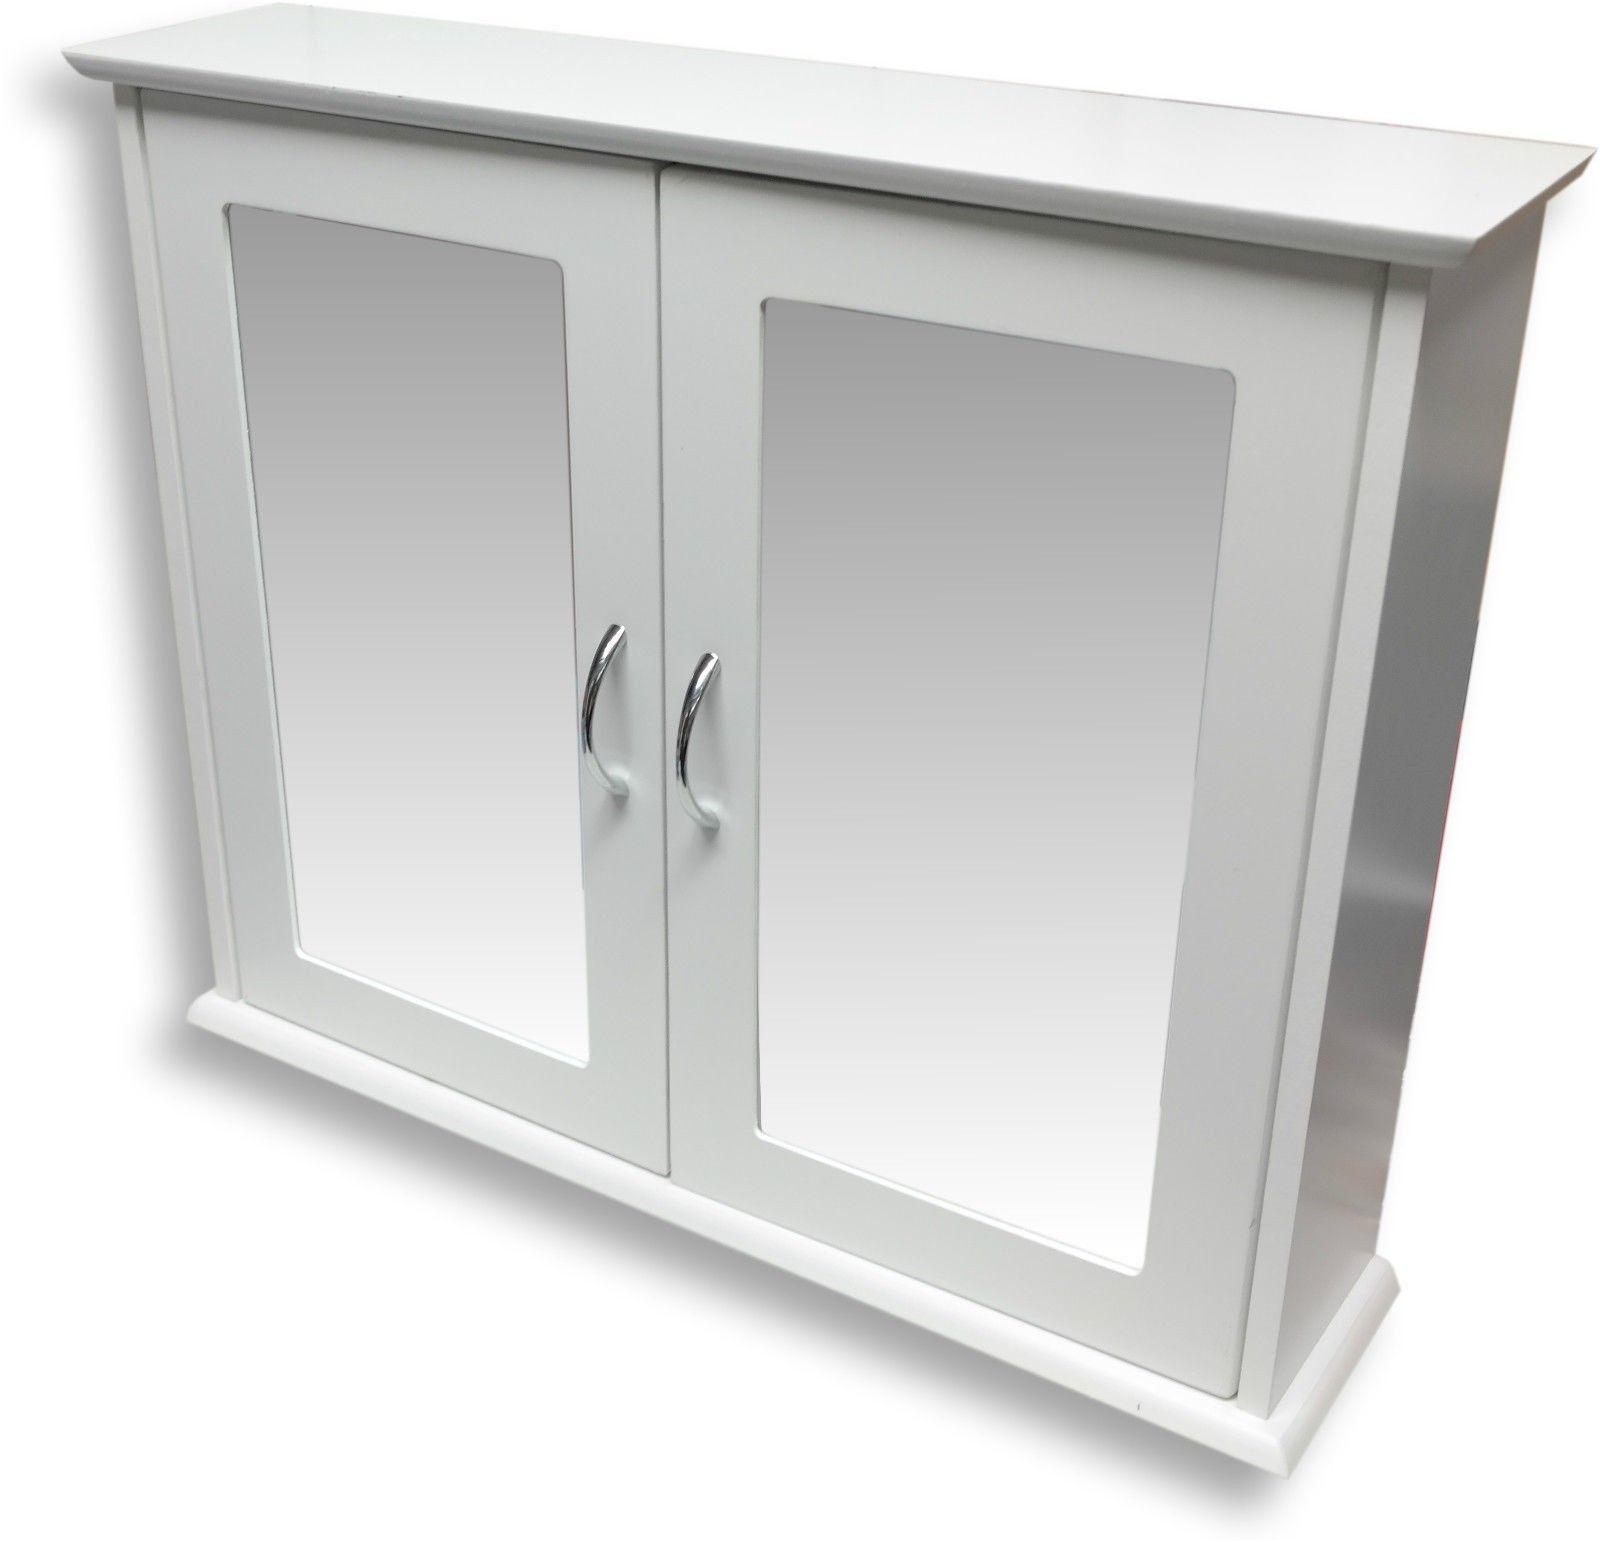 mirrored bathroom cabinet ebay from bathroom mirror cabinets uk rh pinterest co uk Bathroom Mirror Cabinets with Doors Bathroom Tower Cabinet